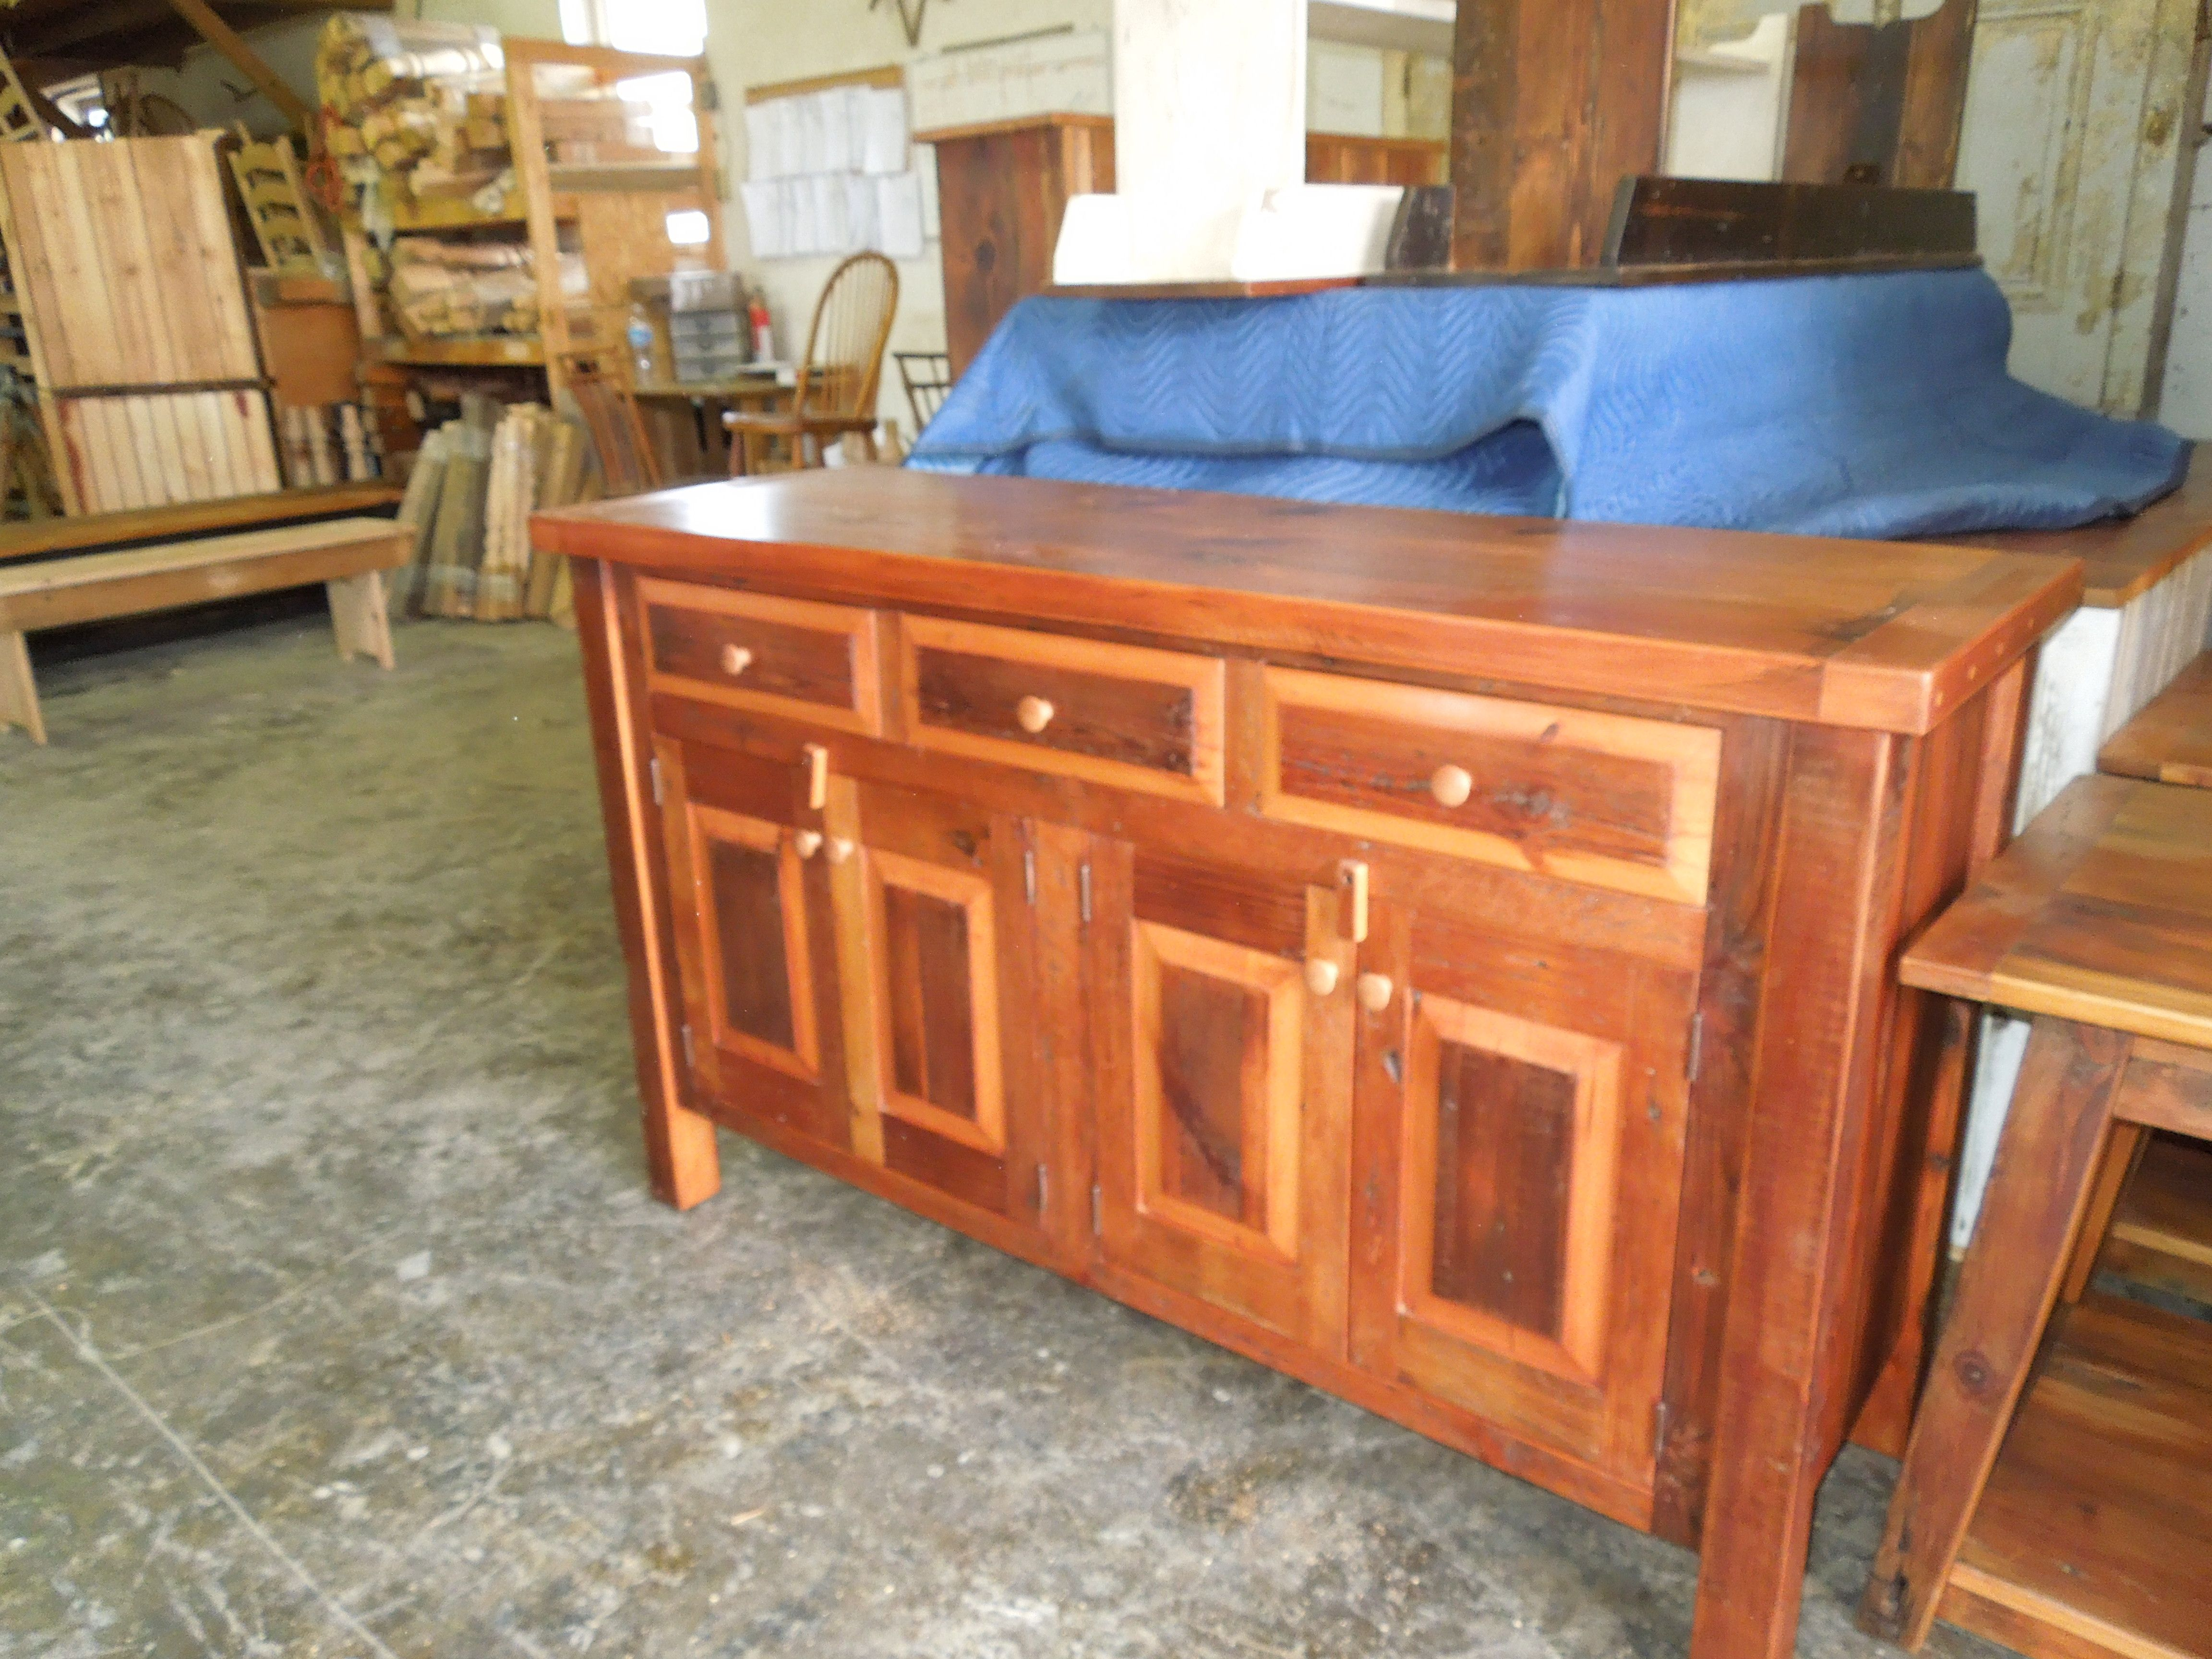 Barn Wood Kitchen Island Reclaimed Furniture